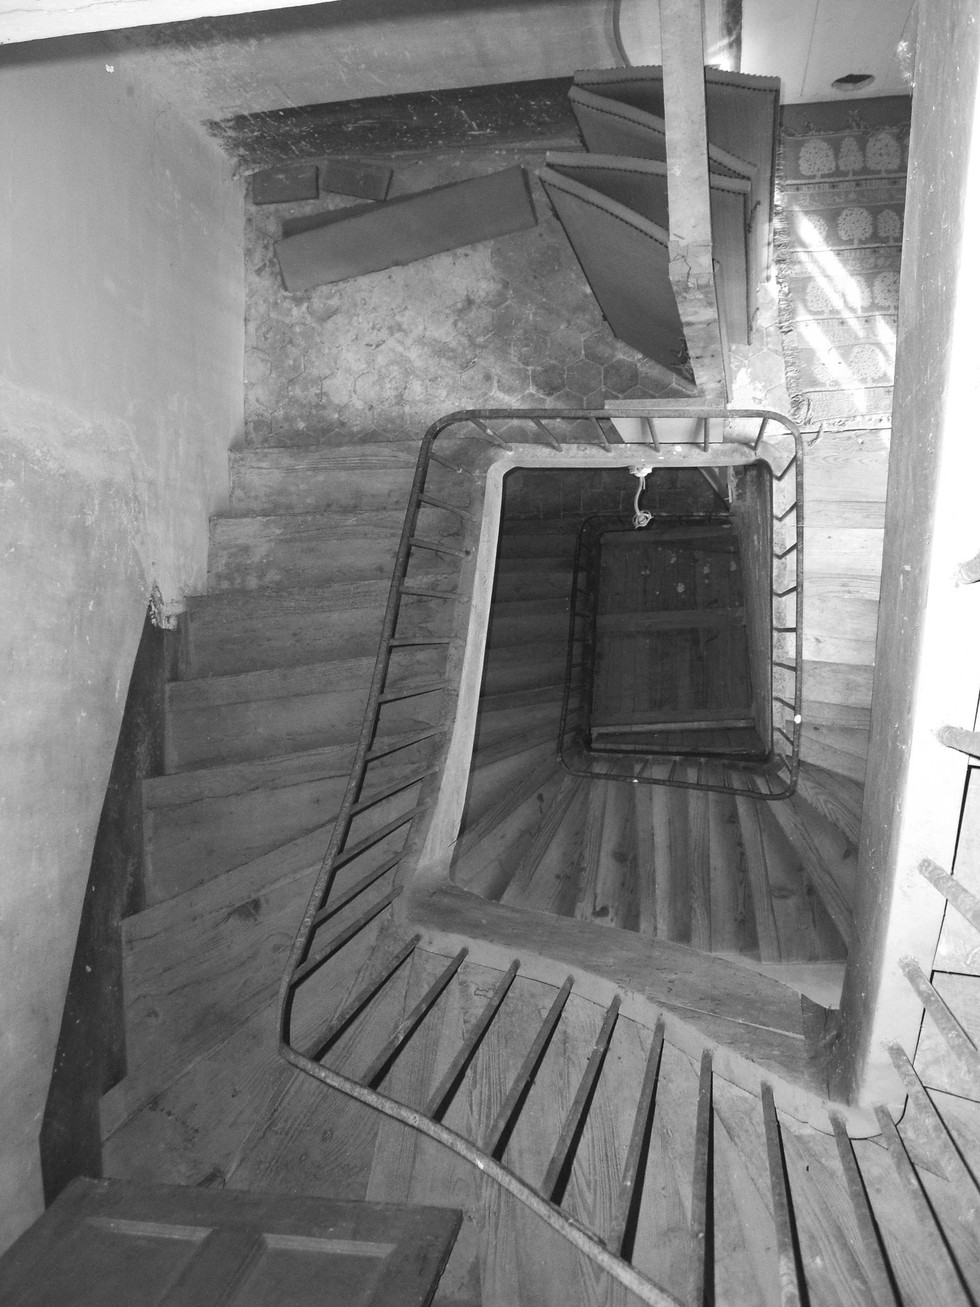 6A princet photo chantier restauration de l'escalier 19e CIMG1577 N&B.jpg